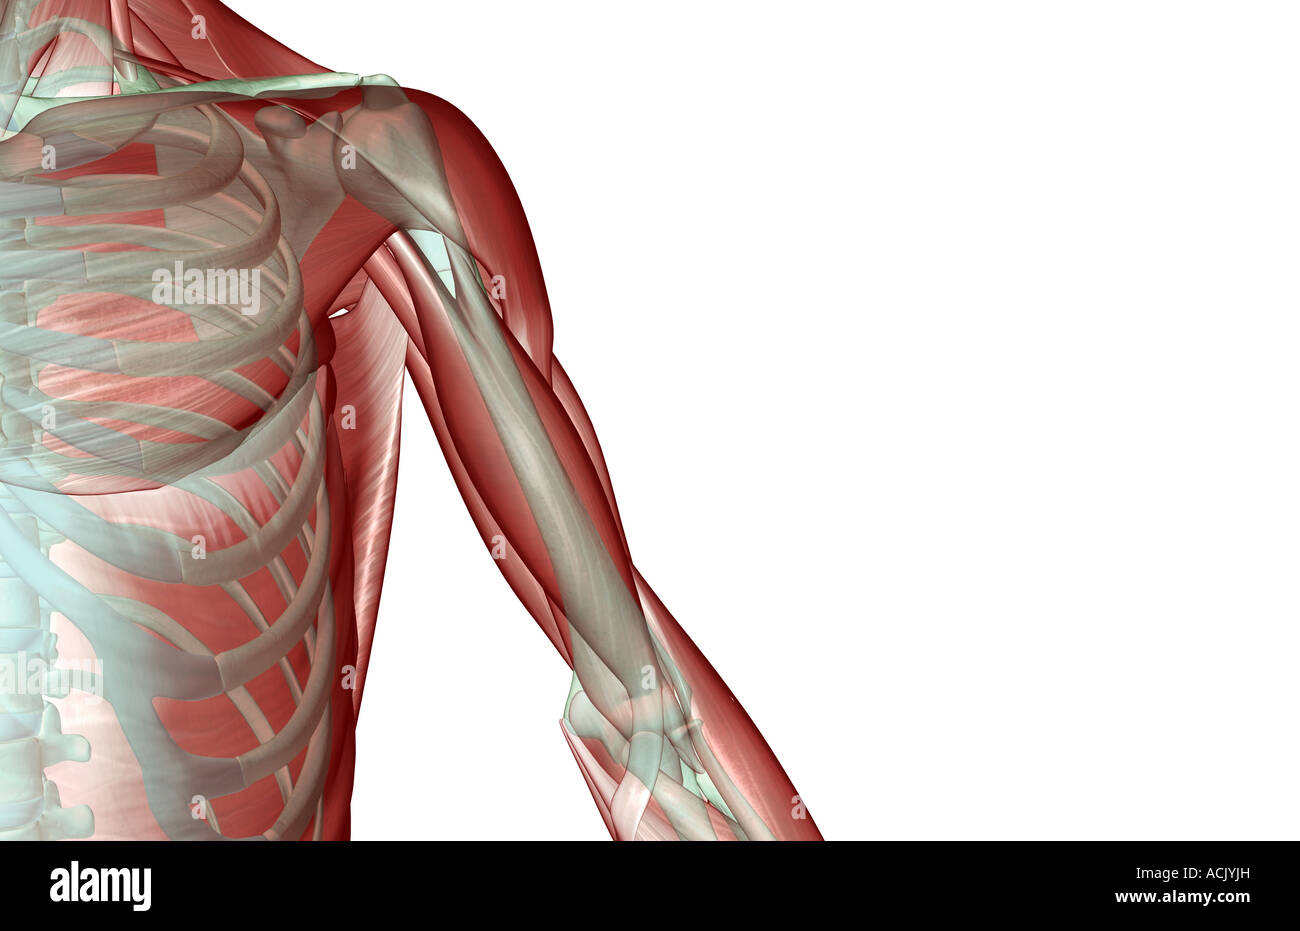 Muscles Shoulder Upper Arm Stock Photos & Muscles Shoulder Upper Arm ...